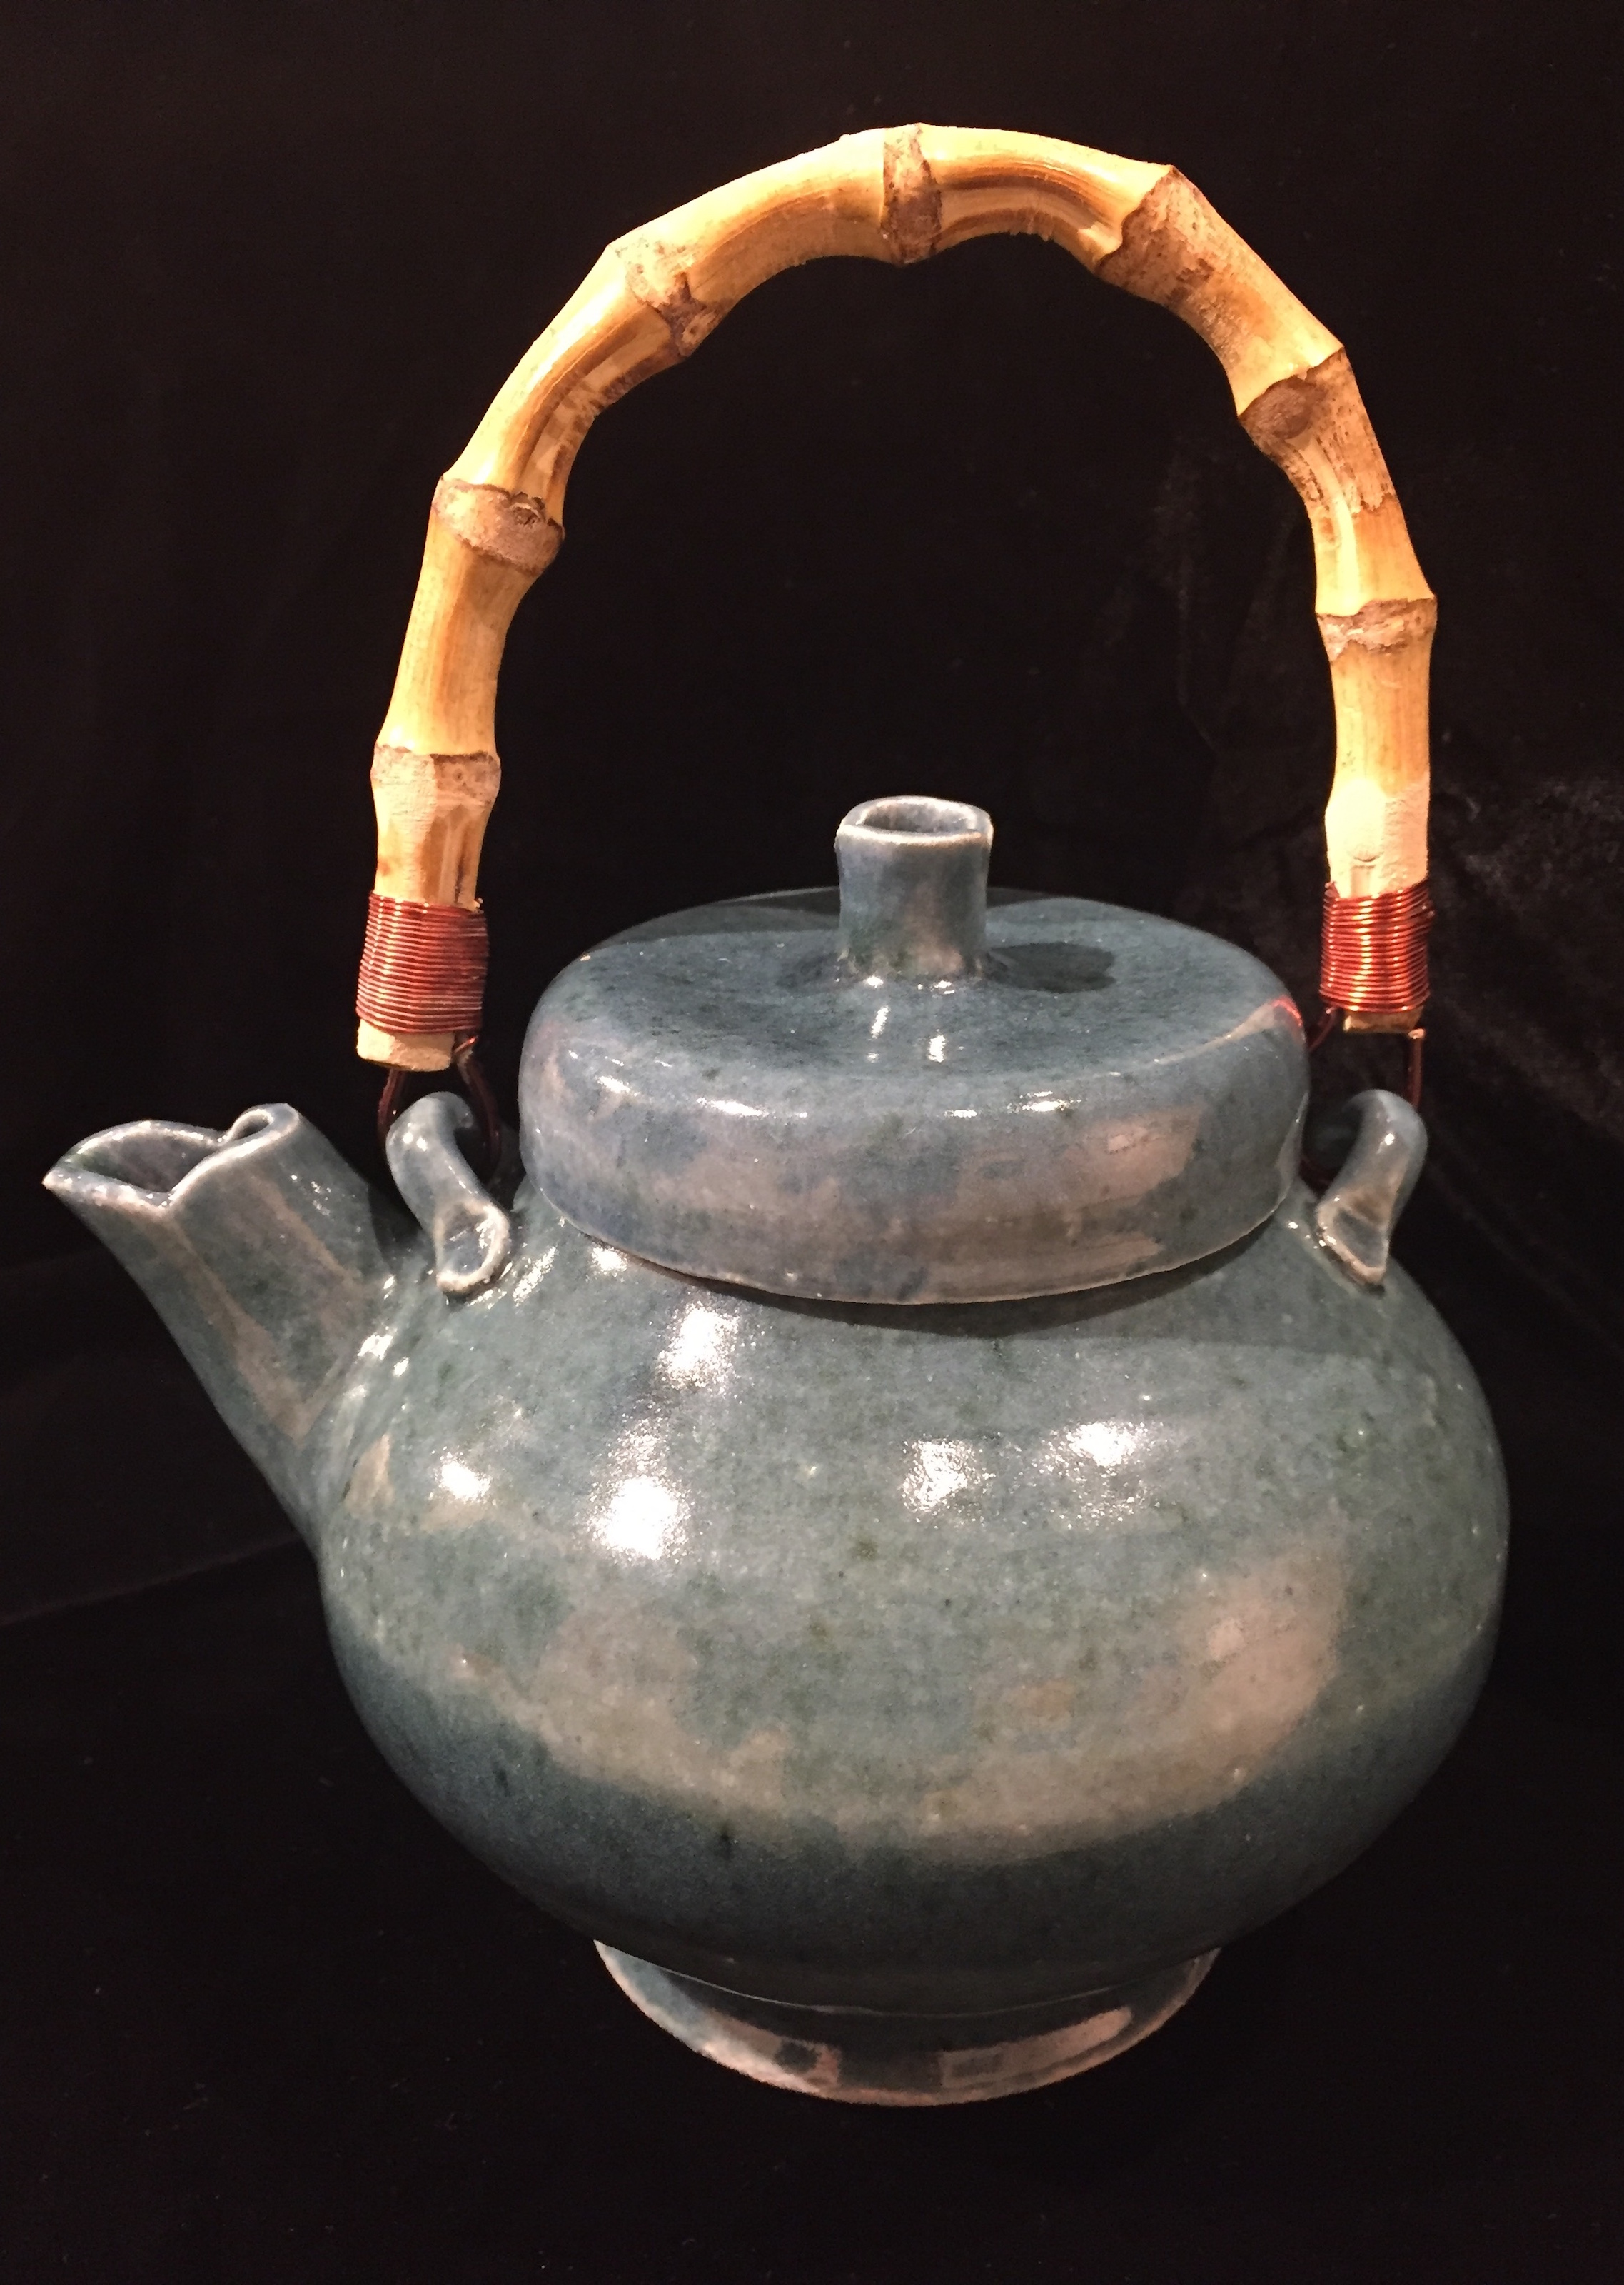 Robins Egg teapot